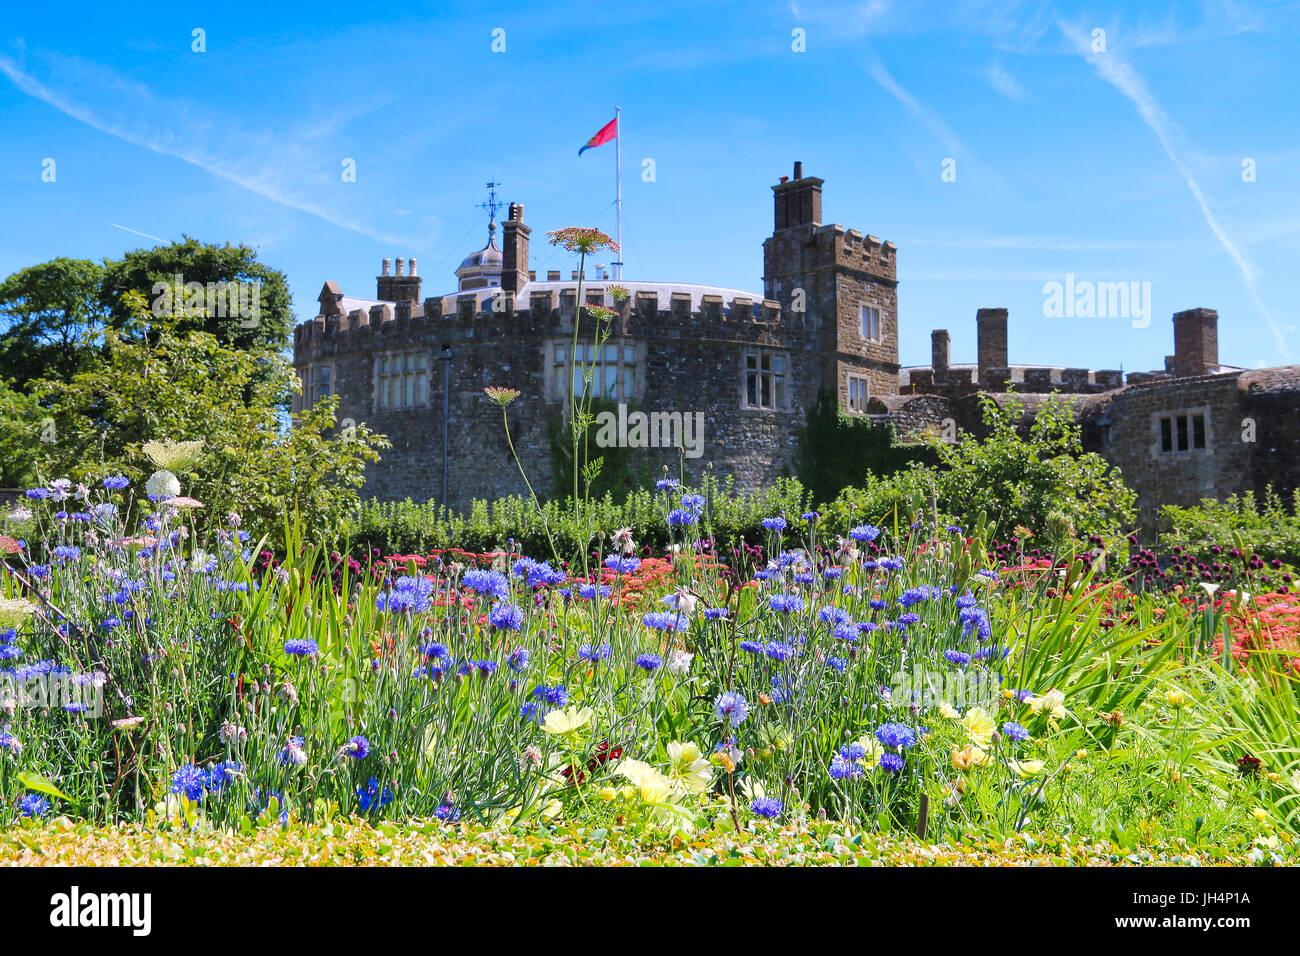 Walmer Castle Gardens July 2017 Stock Photo